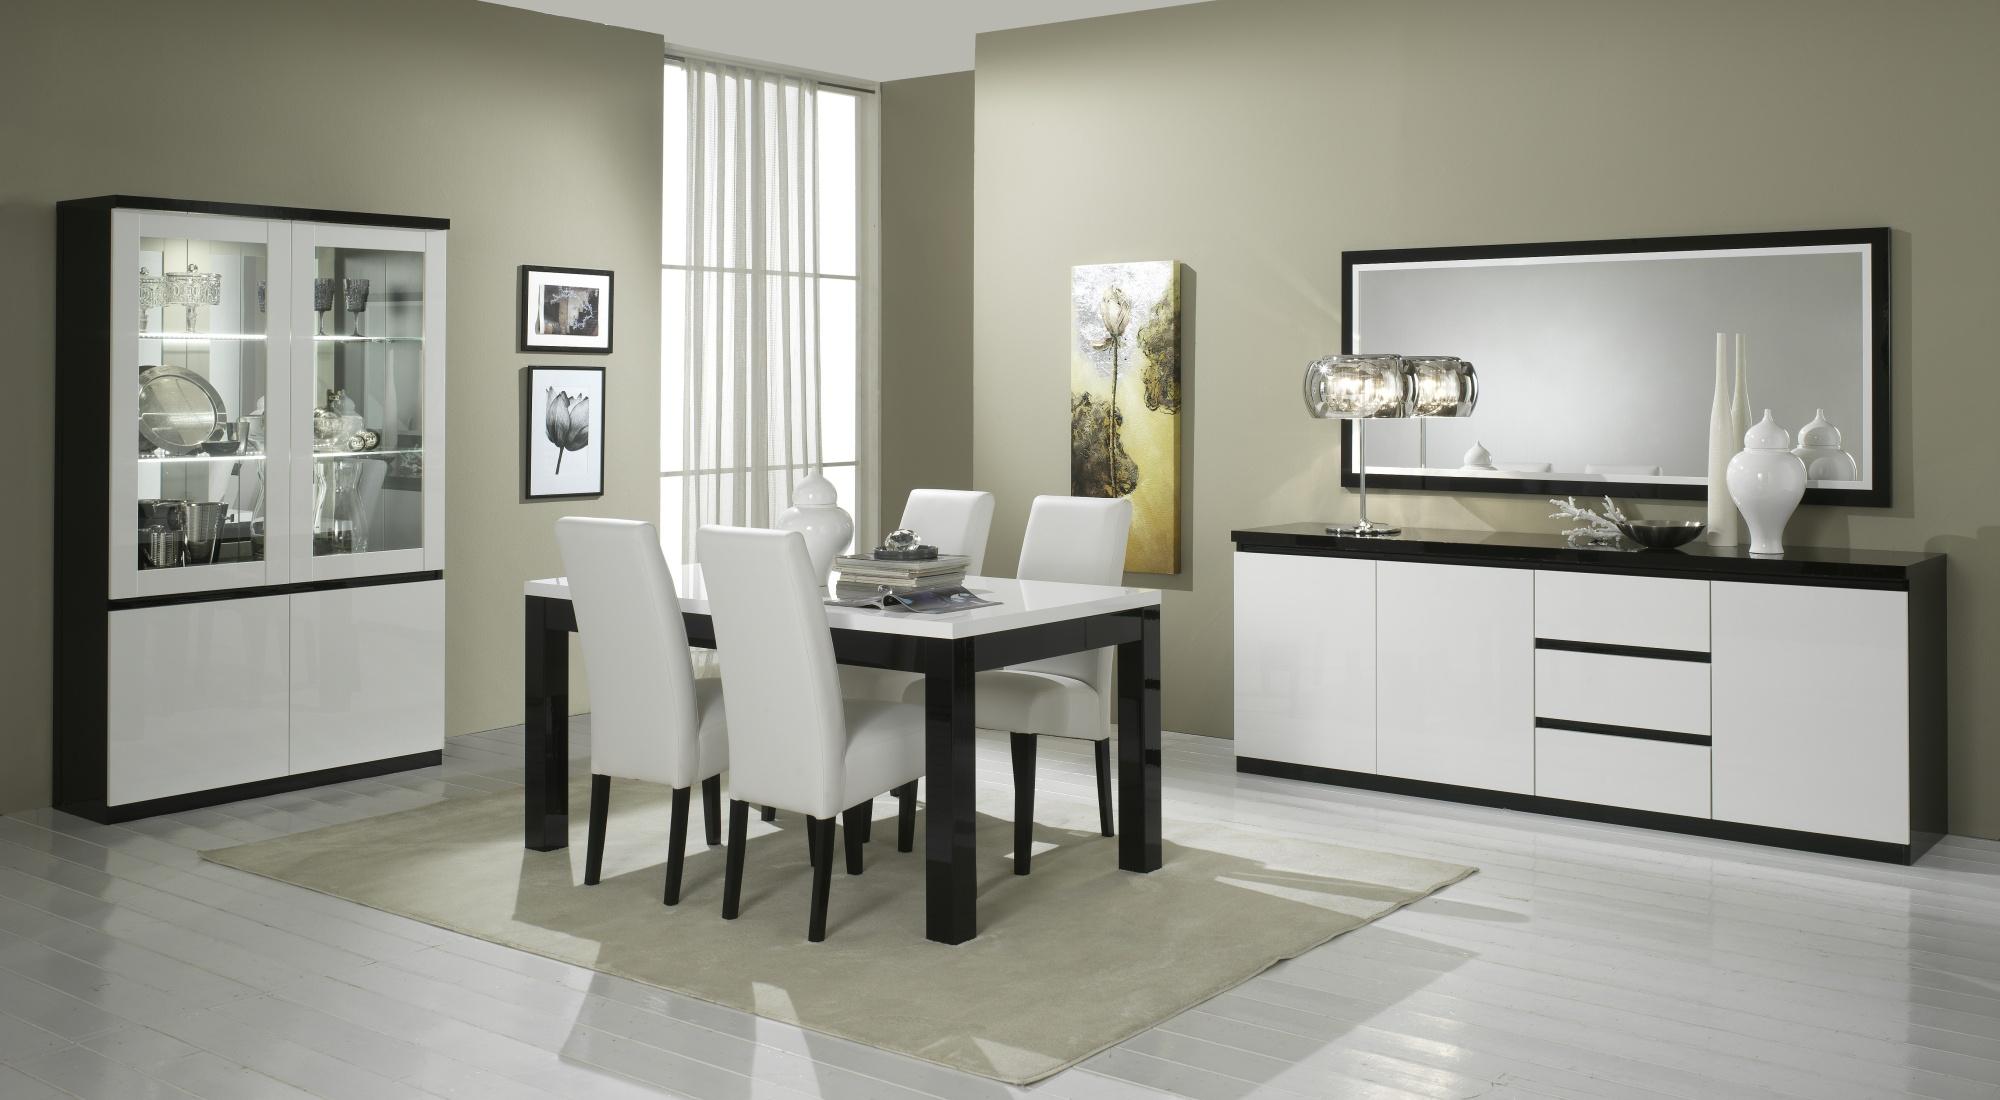 miroir rectangulaire de salle manger design laqu blanc et noir krista matelpro